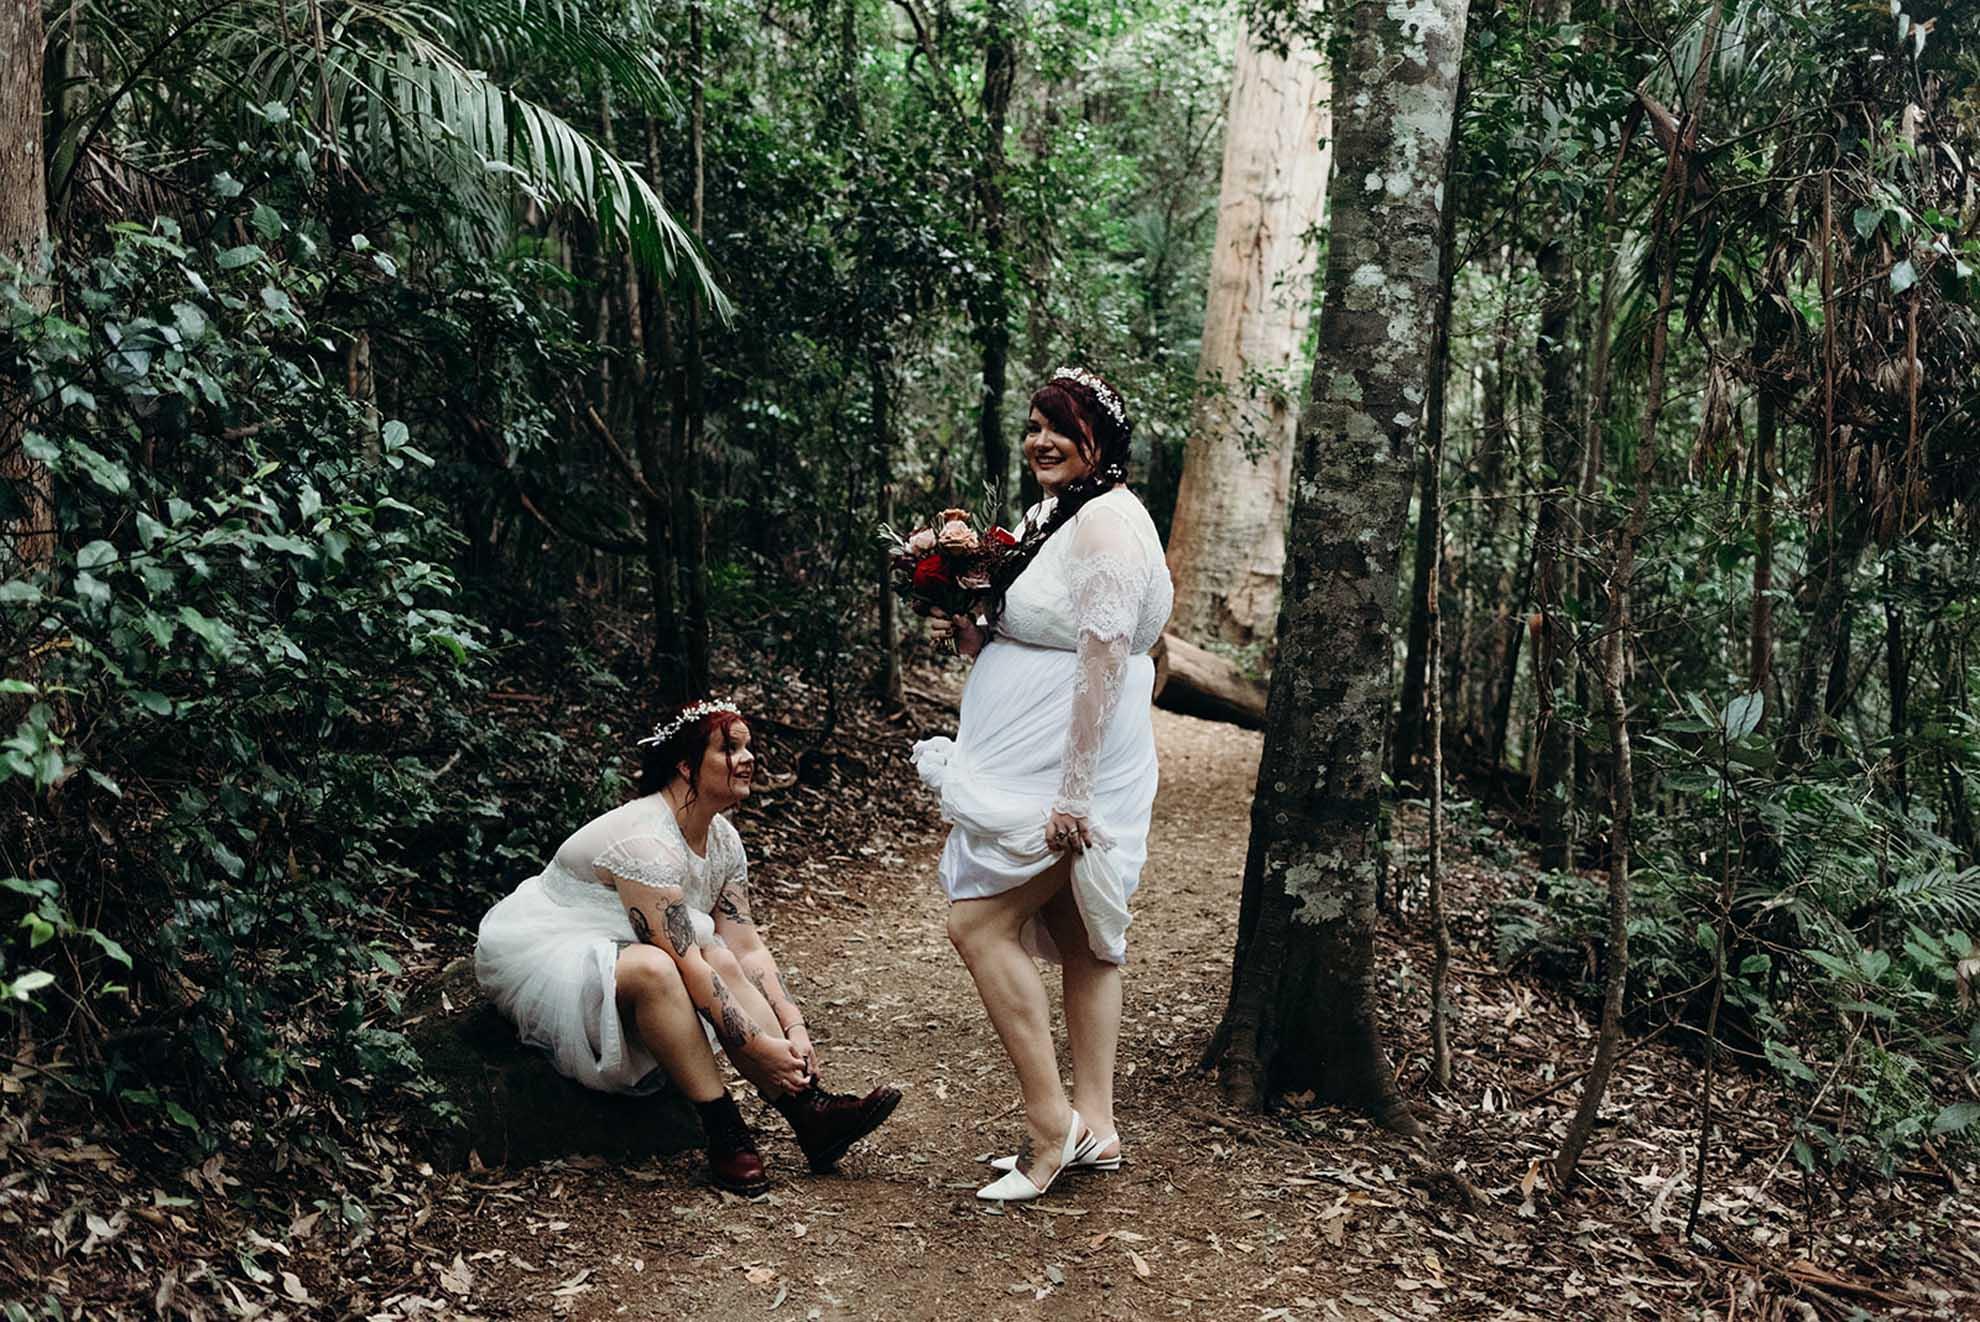 Daphne Sky Studios Mount Tamborine Scenic Rim Gold Coast lesbian gay same-sex covid-19 wedding elopement Dancing With He